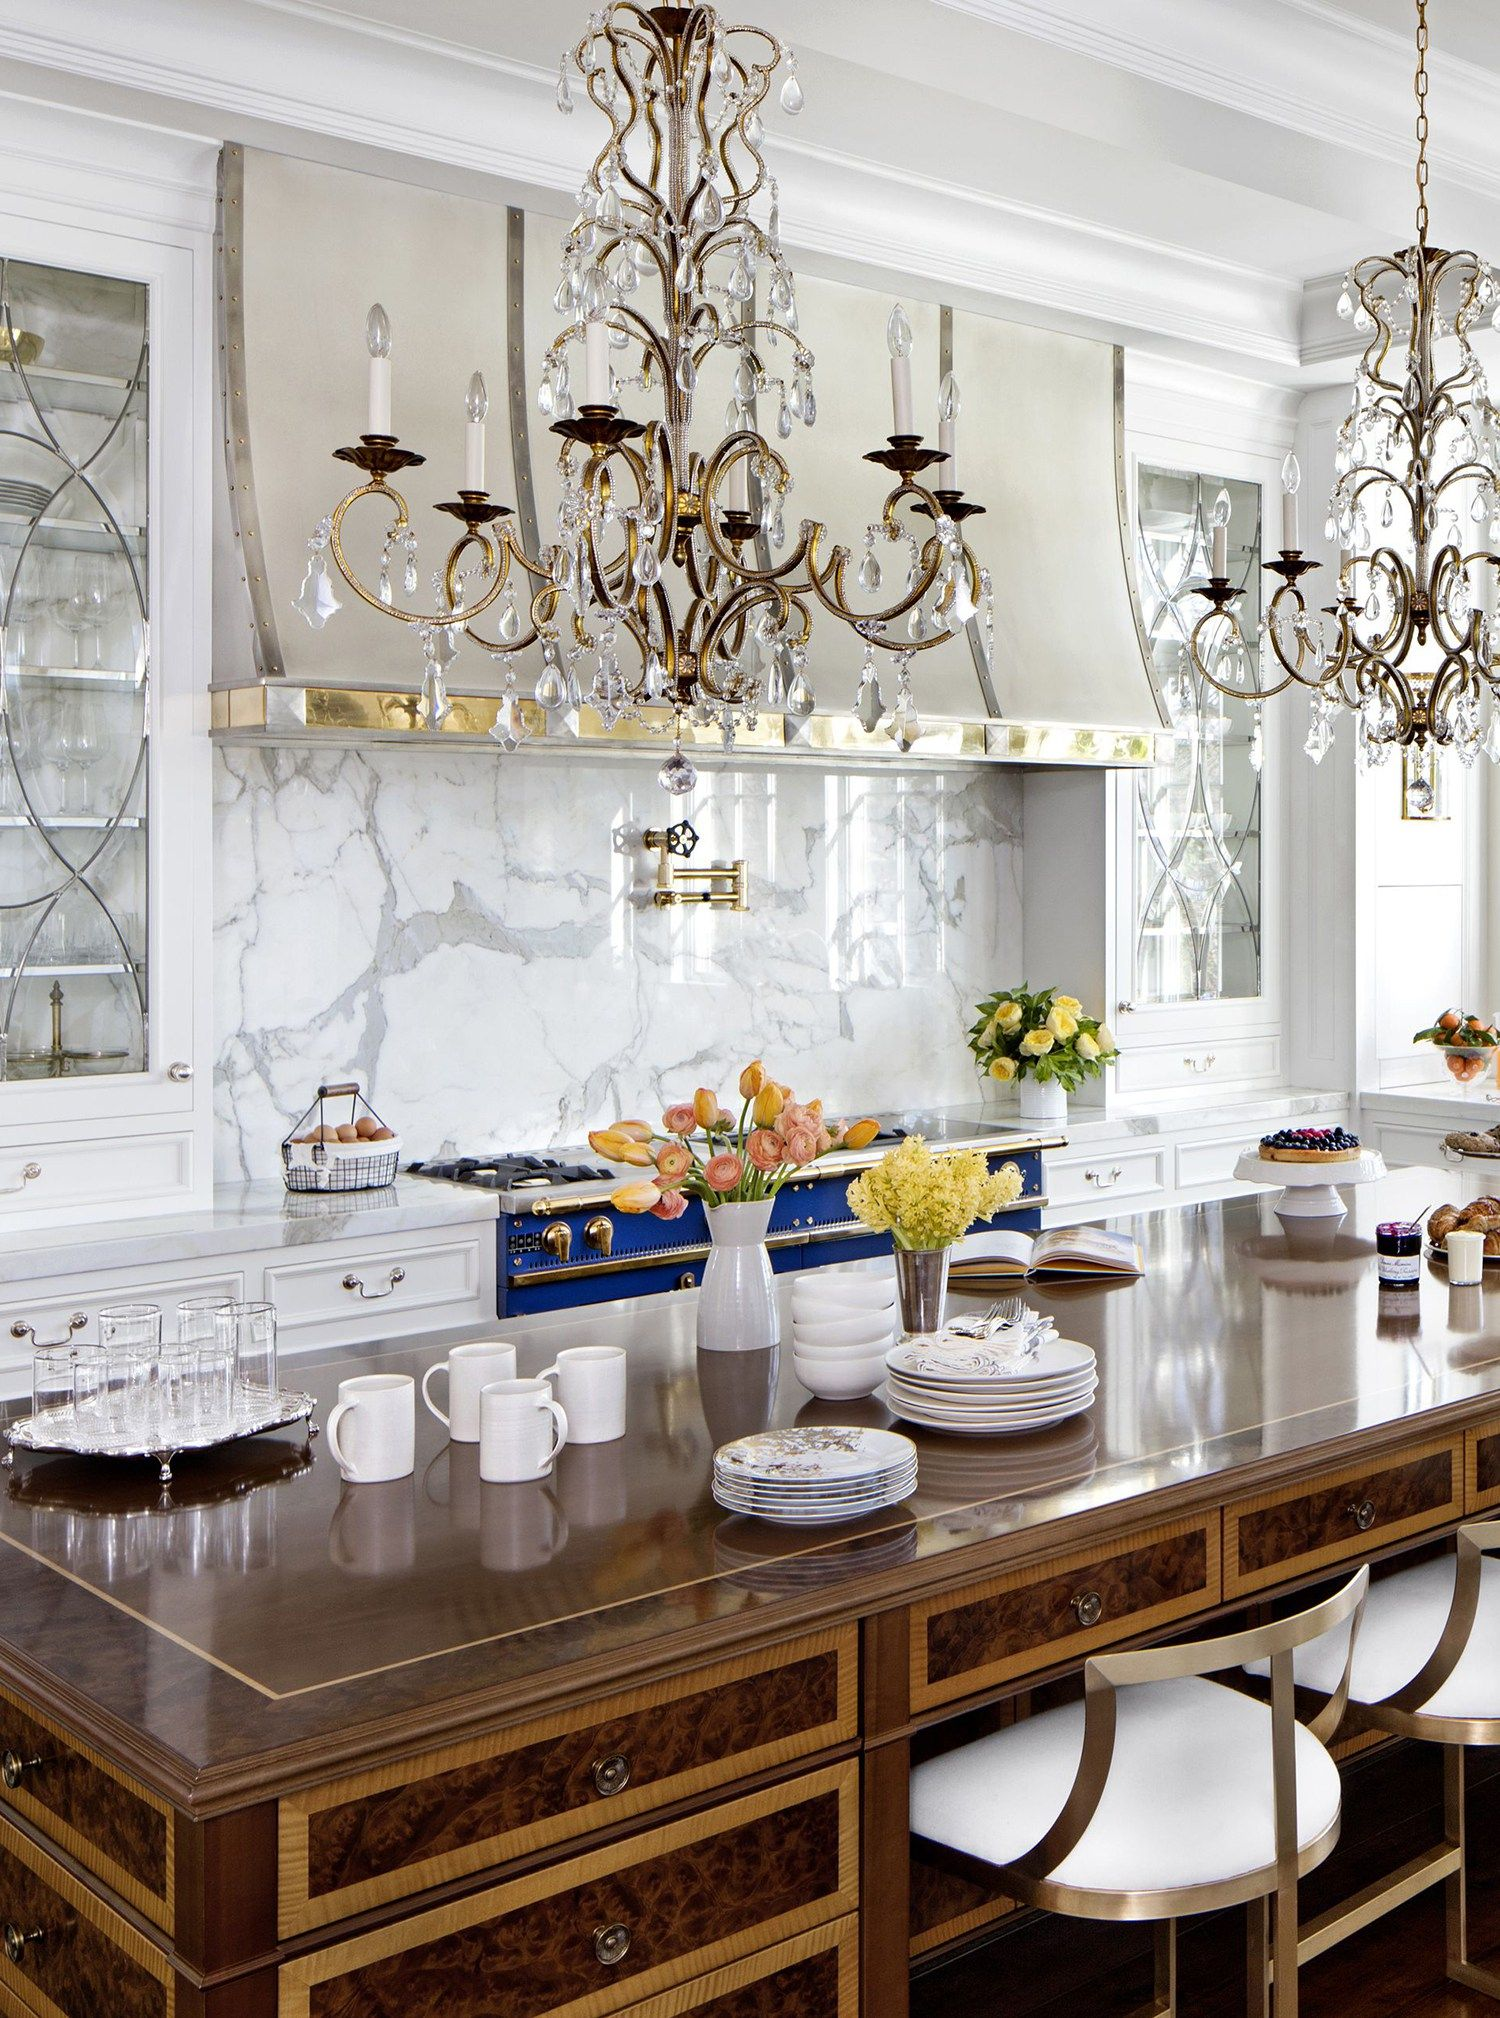 elegant kitchen ideas in 2020 elegant kitchens kitchen design fancy kitchens on kitchen ideas elegant id=43214